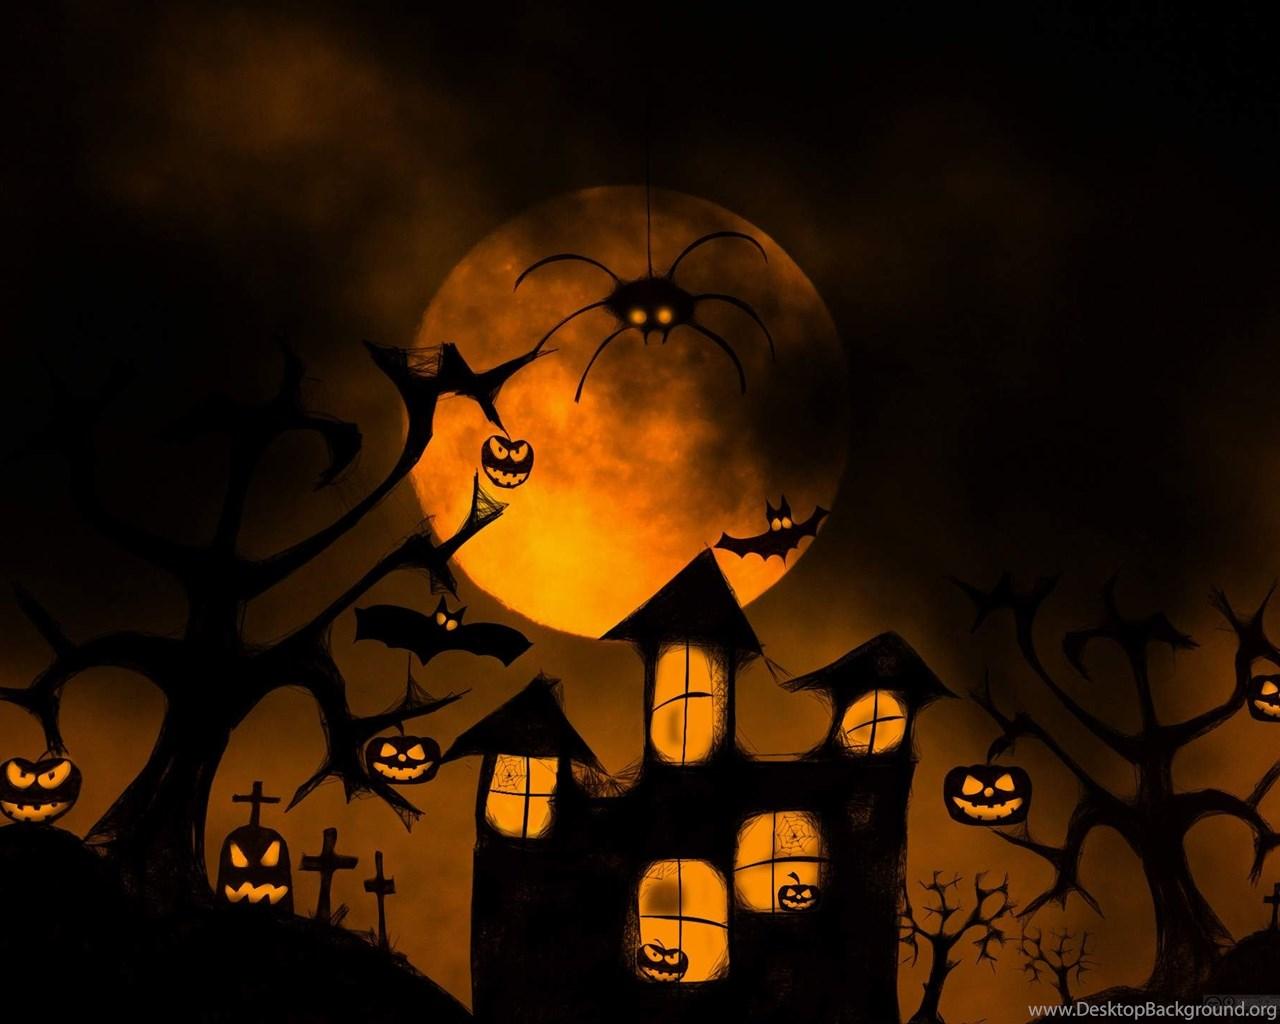 нашла картинки фон хэллоуин прокладок впускном